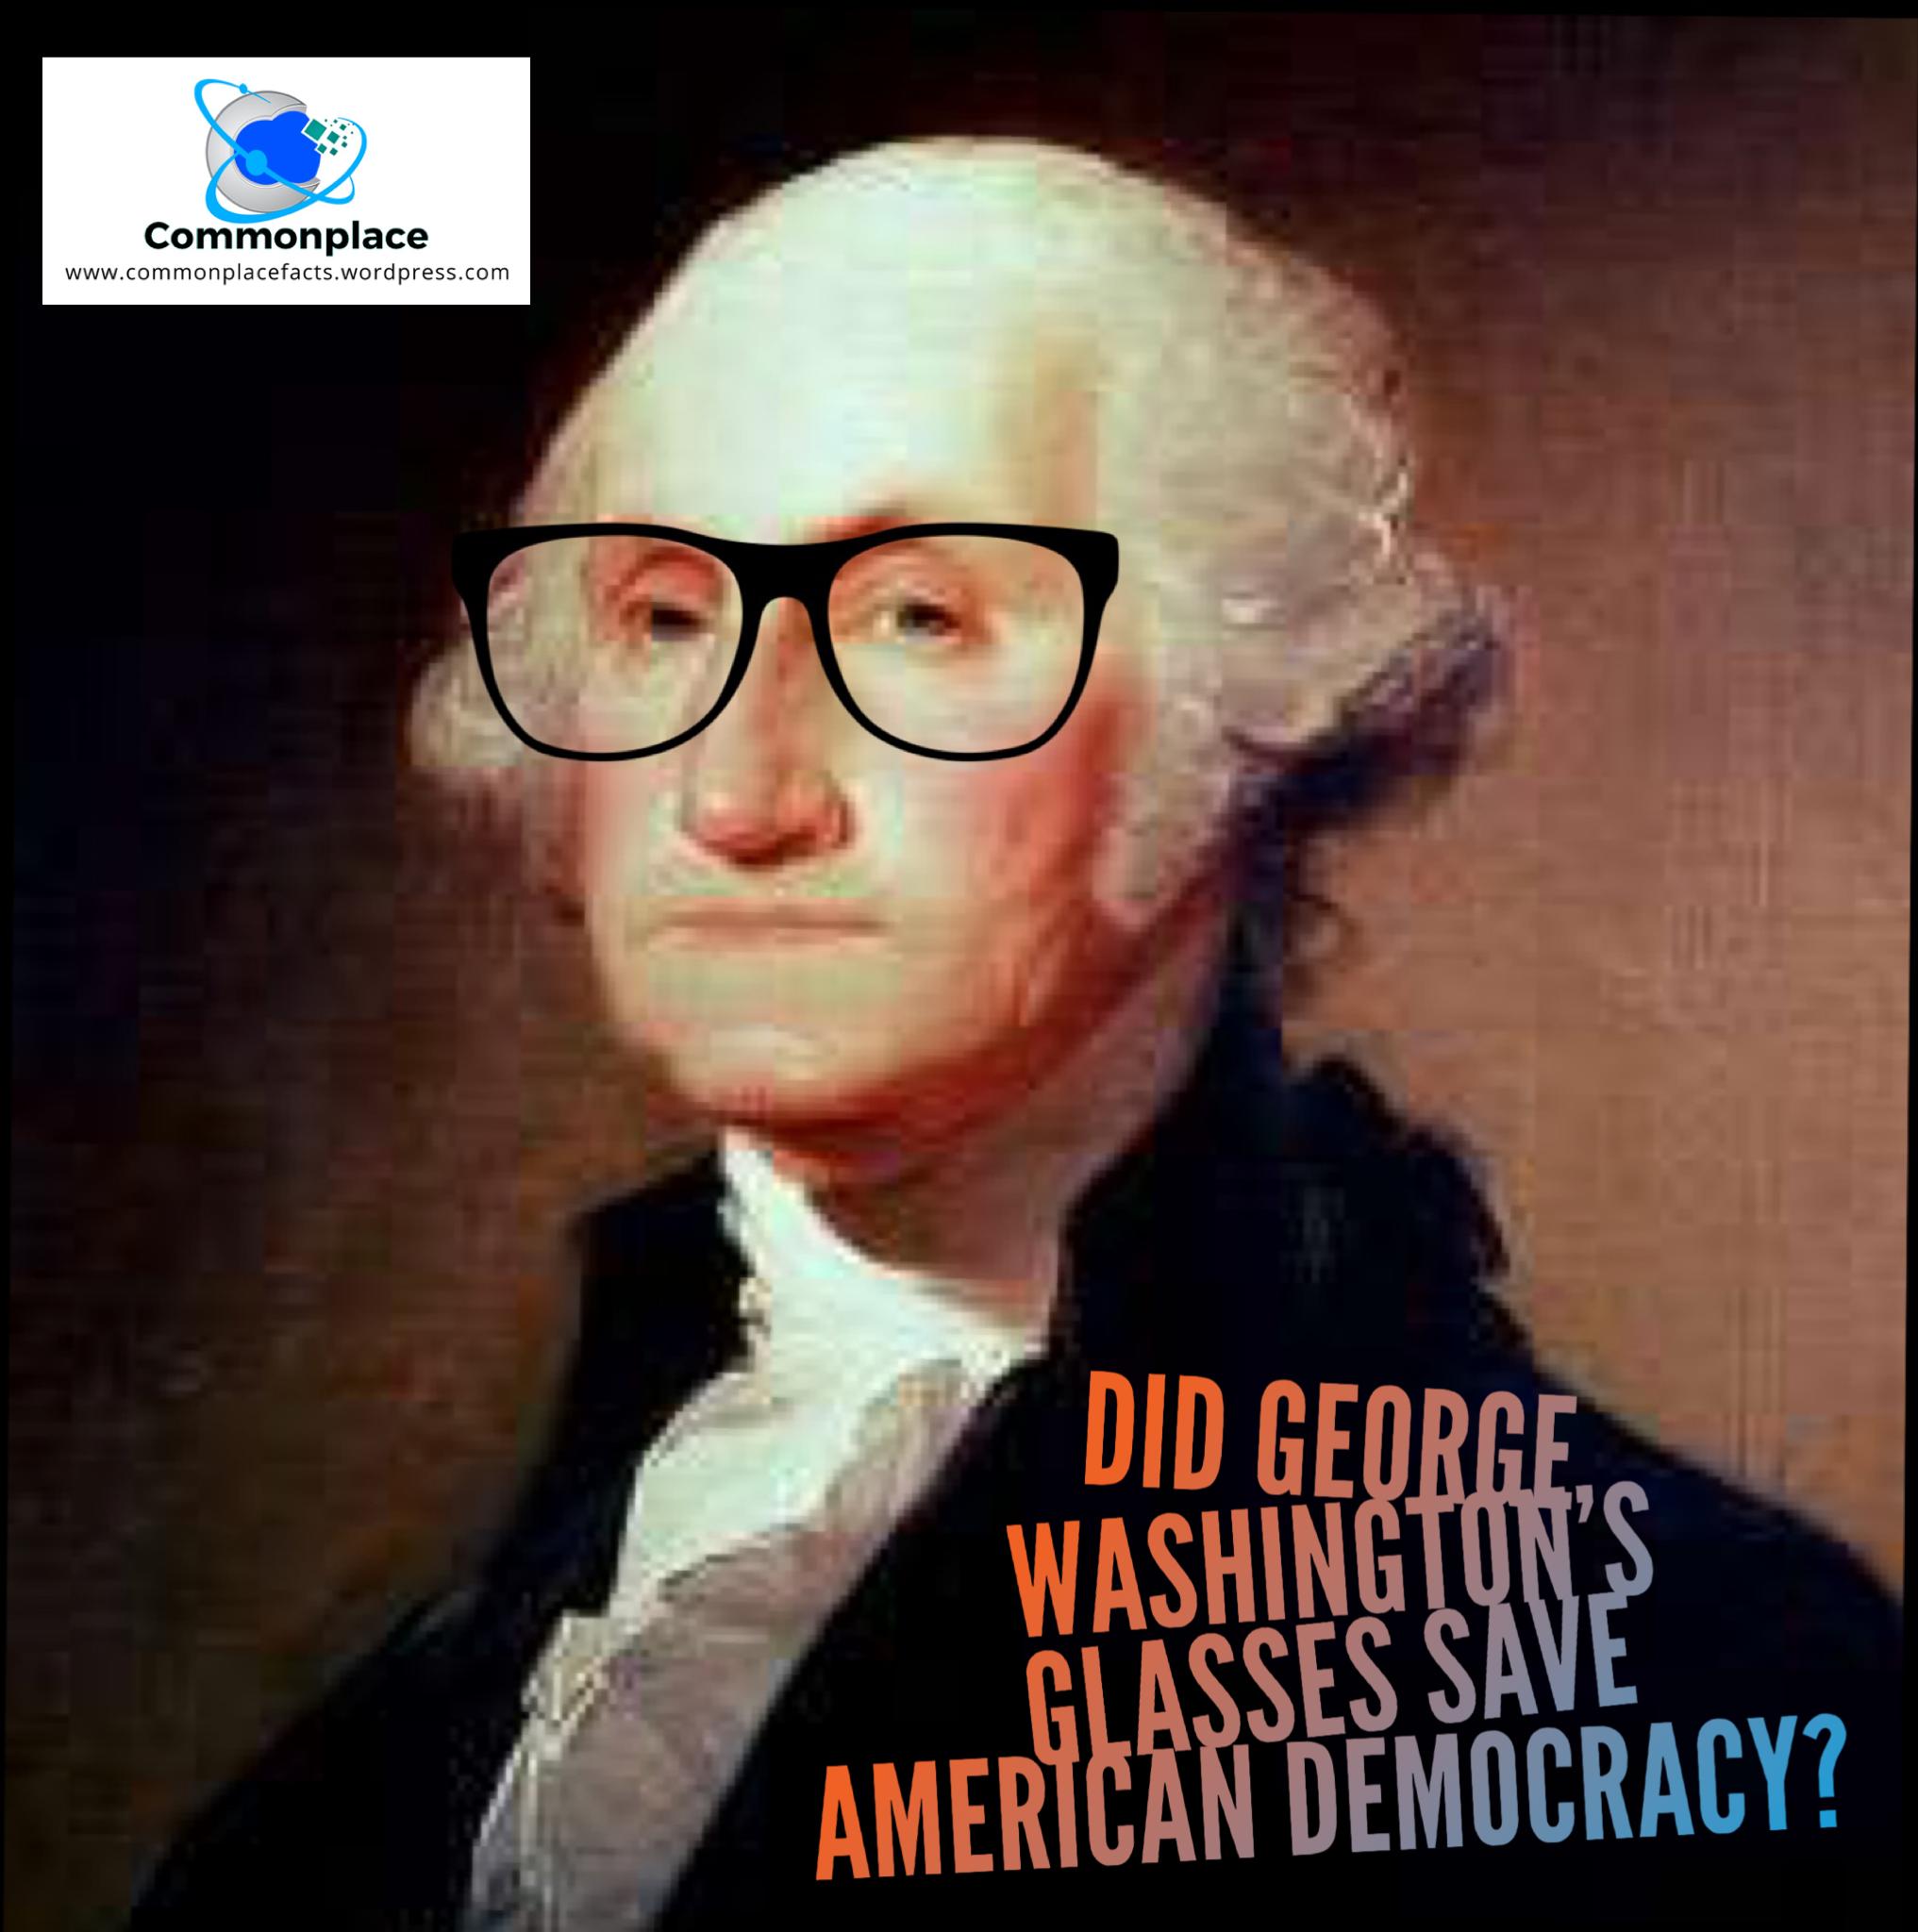 #eyesight #vision #glasses #GeorgeWashington #USA #democracy